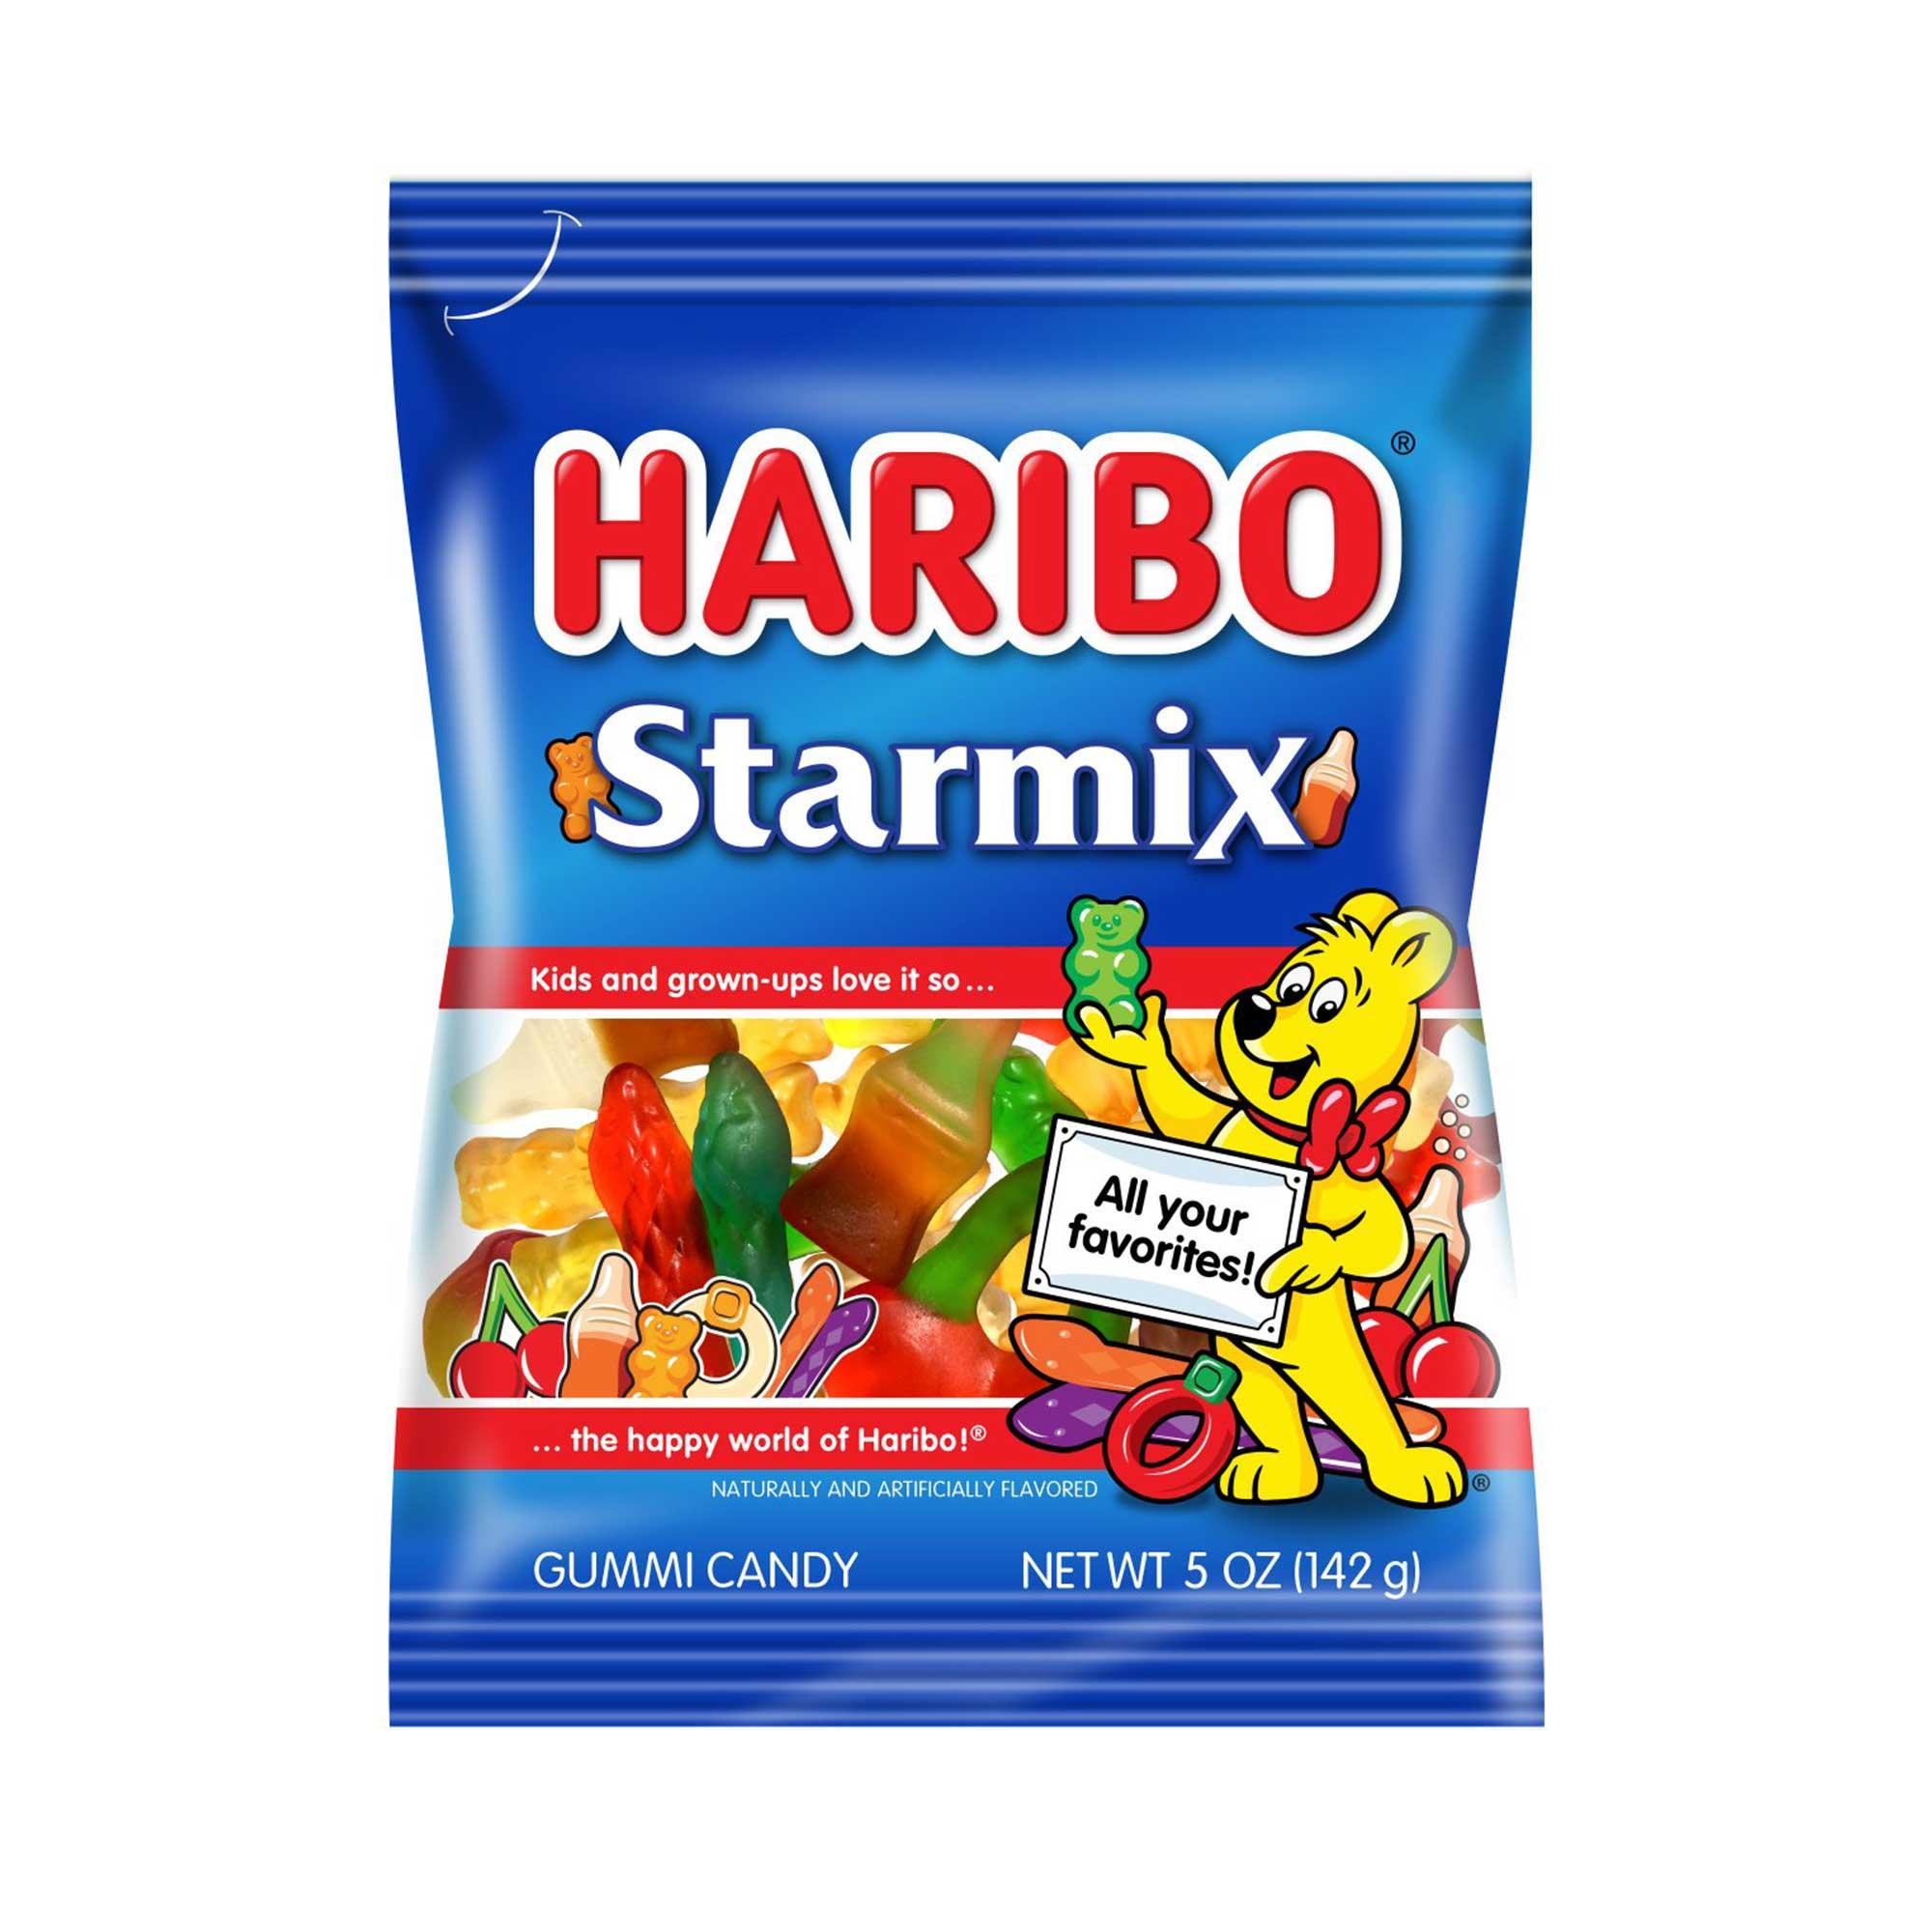 medium haribo gummy candy starmix 5 oz  pwWE8aTDj